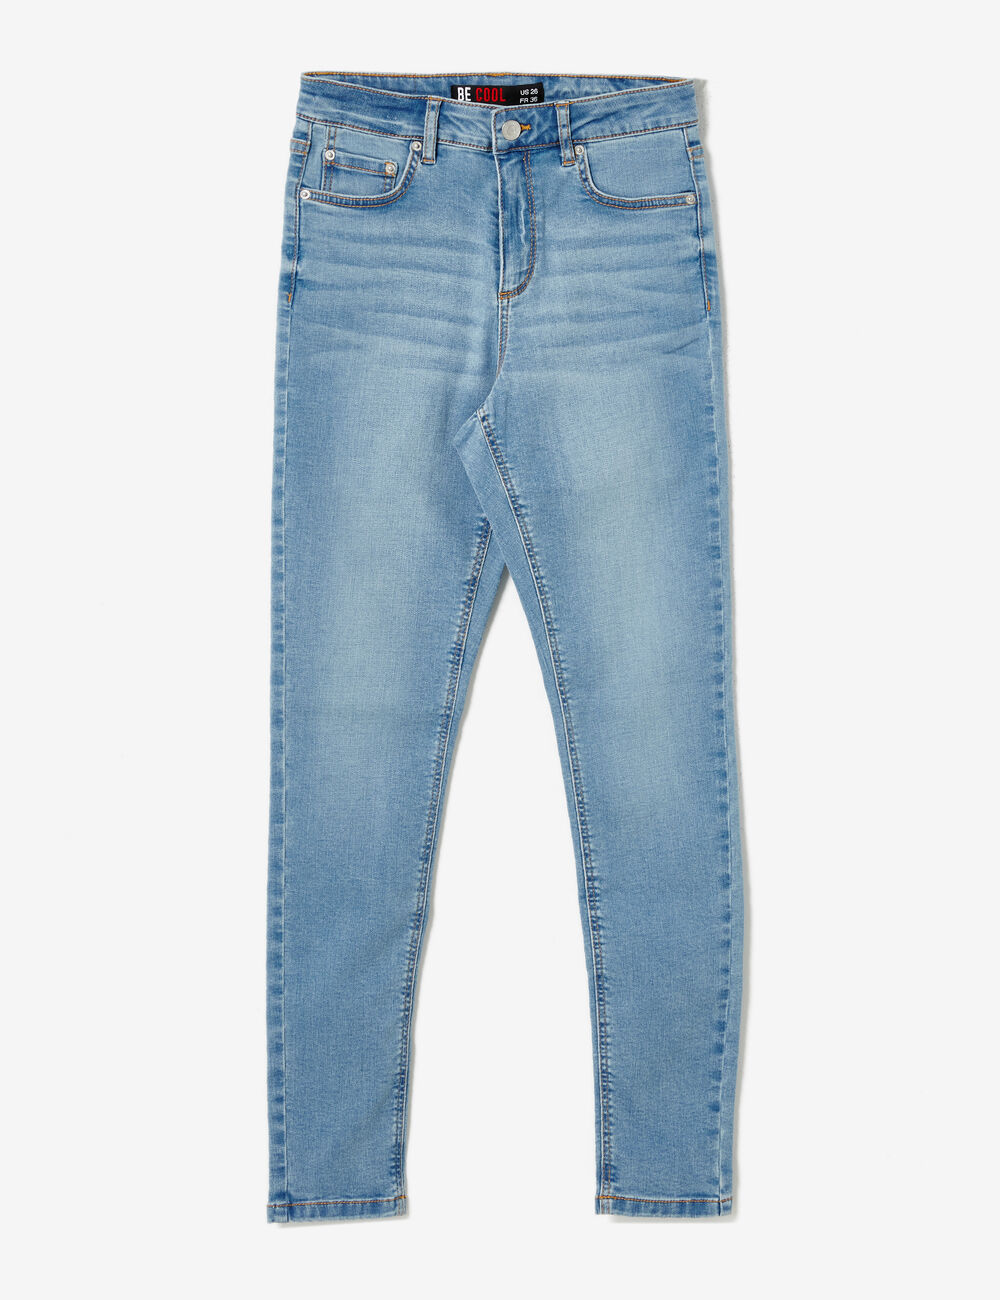 jean super skinny taille haute bleu ciel ...